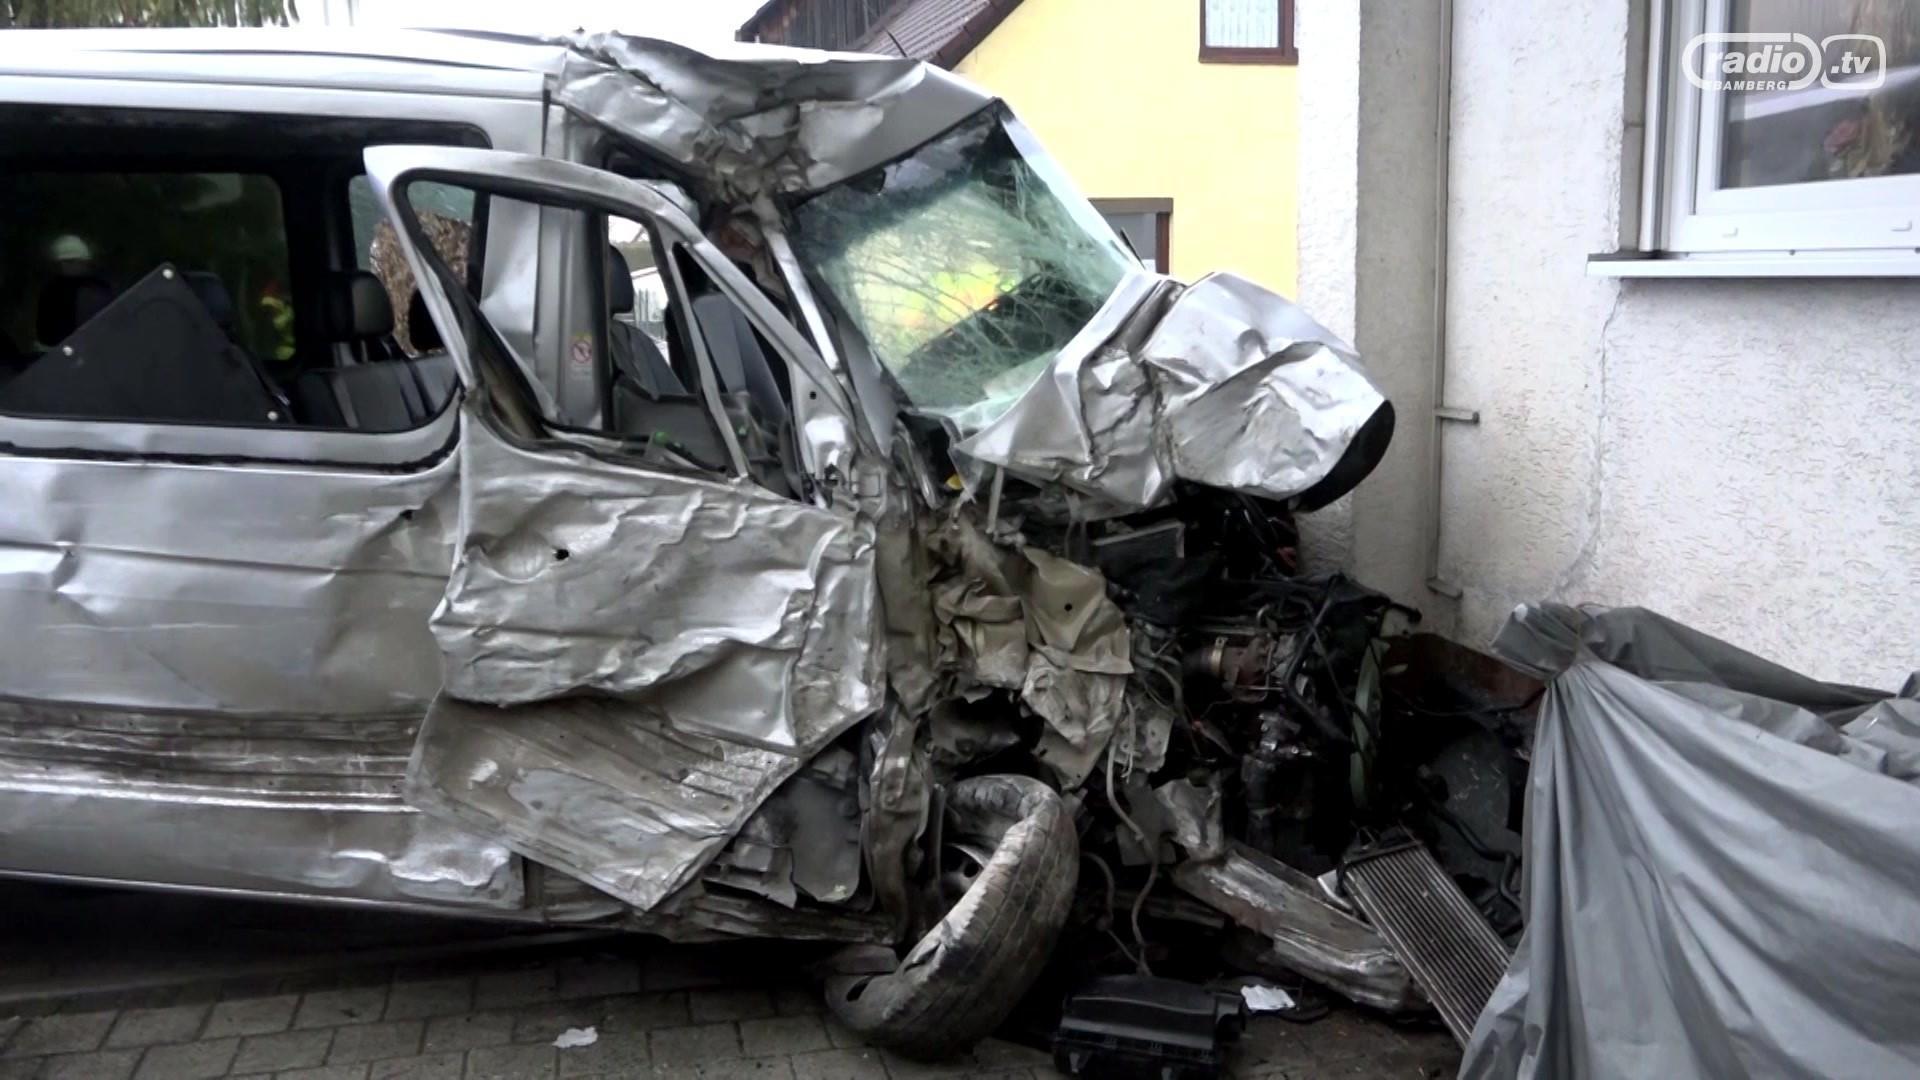 Oesdorf: Kleintransporter kracht in Haus | Radio Bamberg